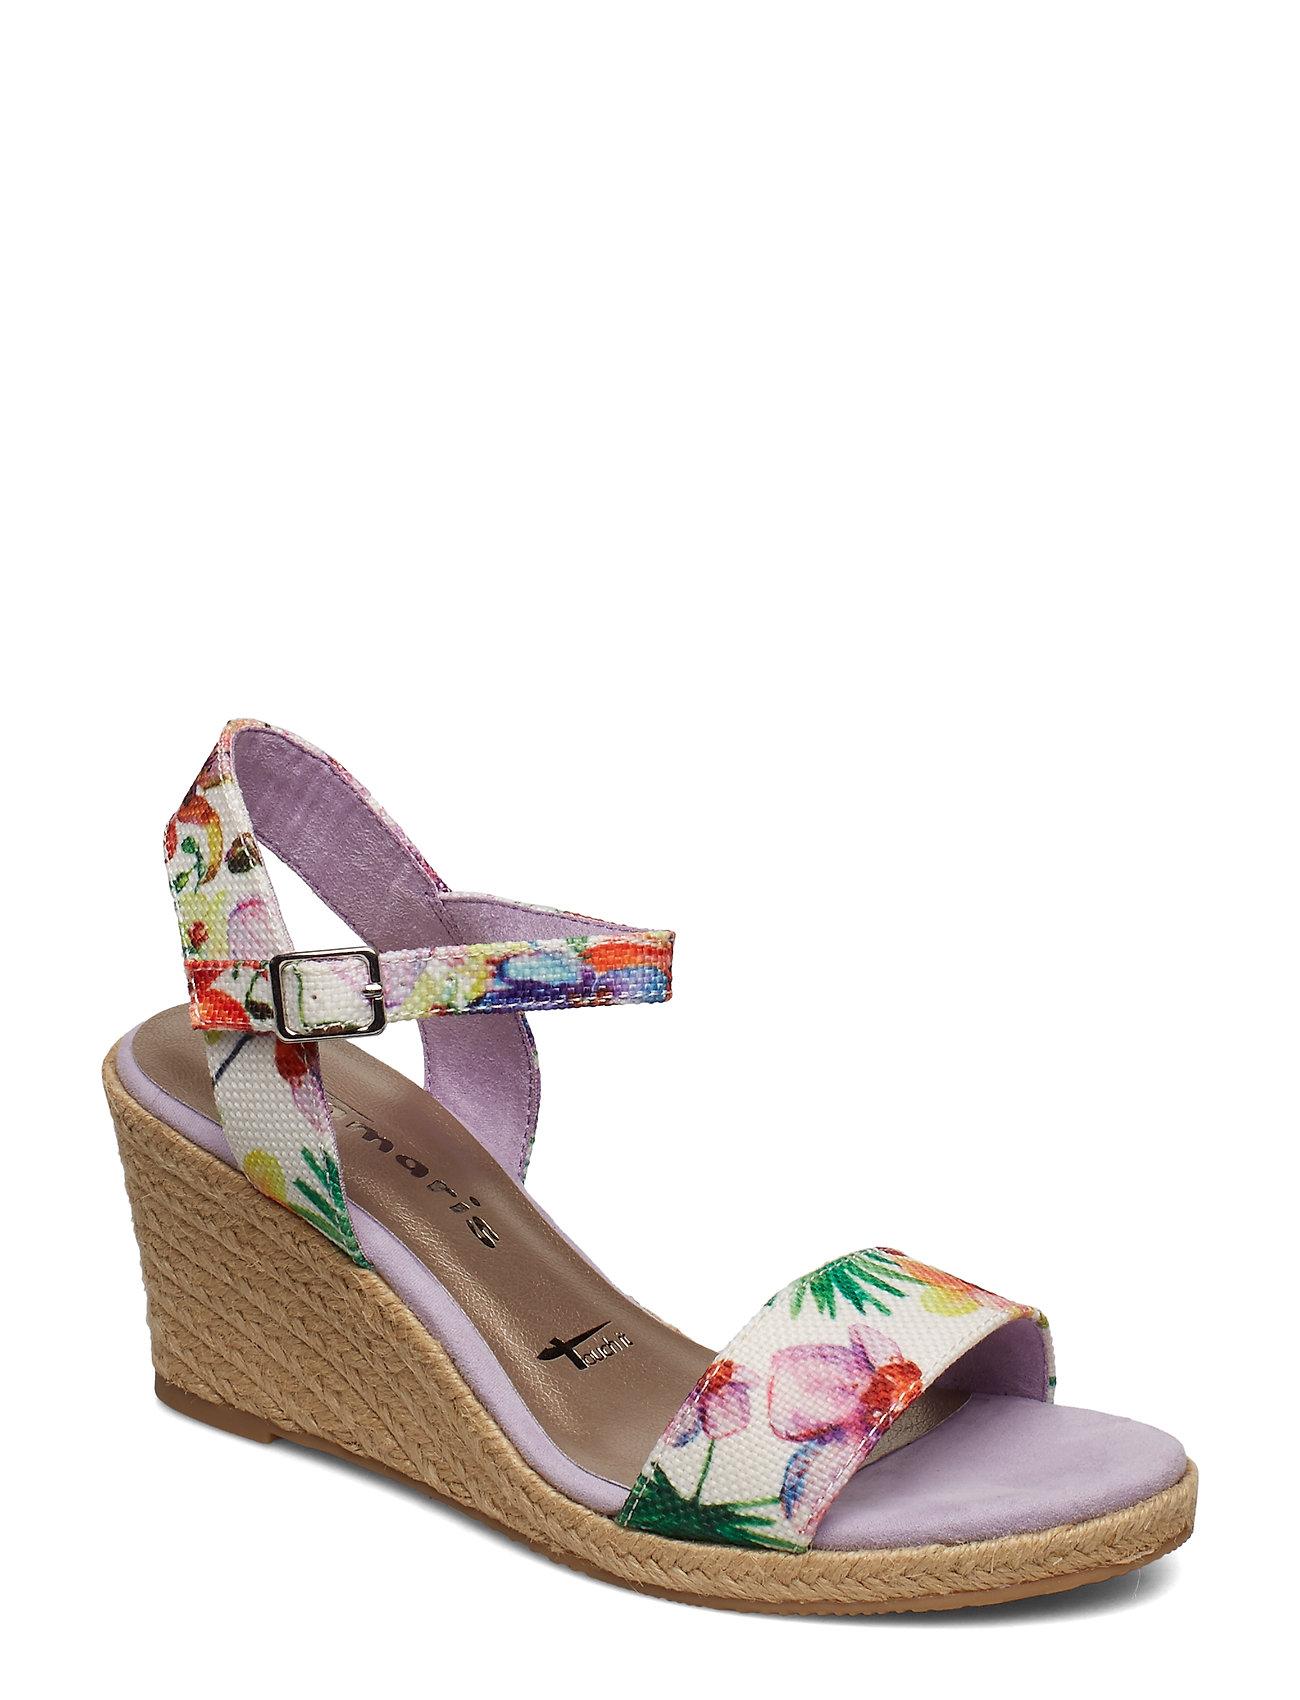 Tamaris Sandals - FLOWER COMB